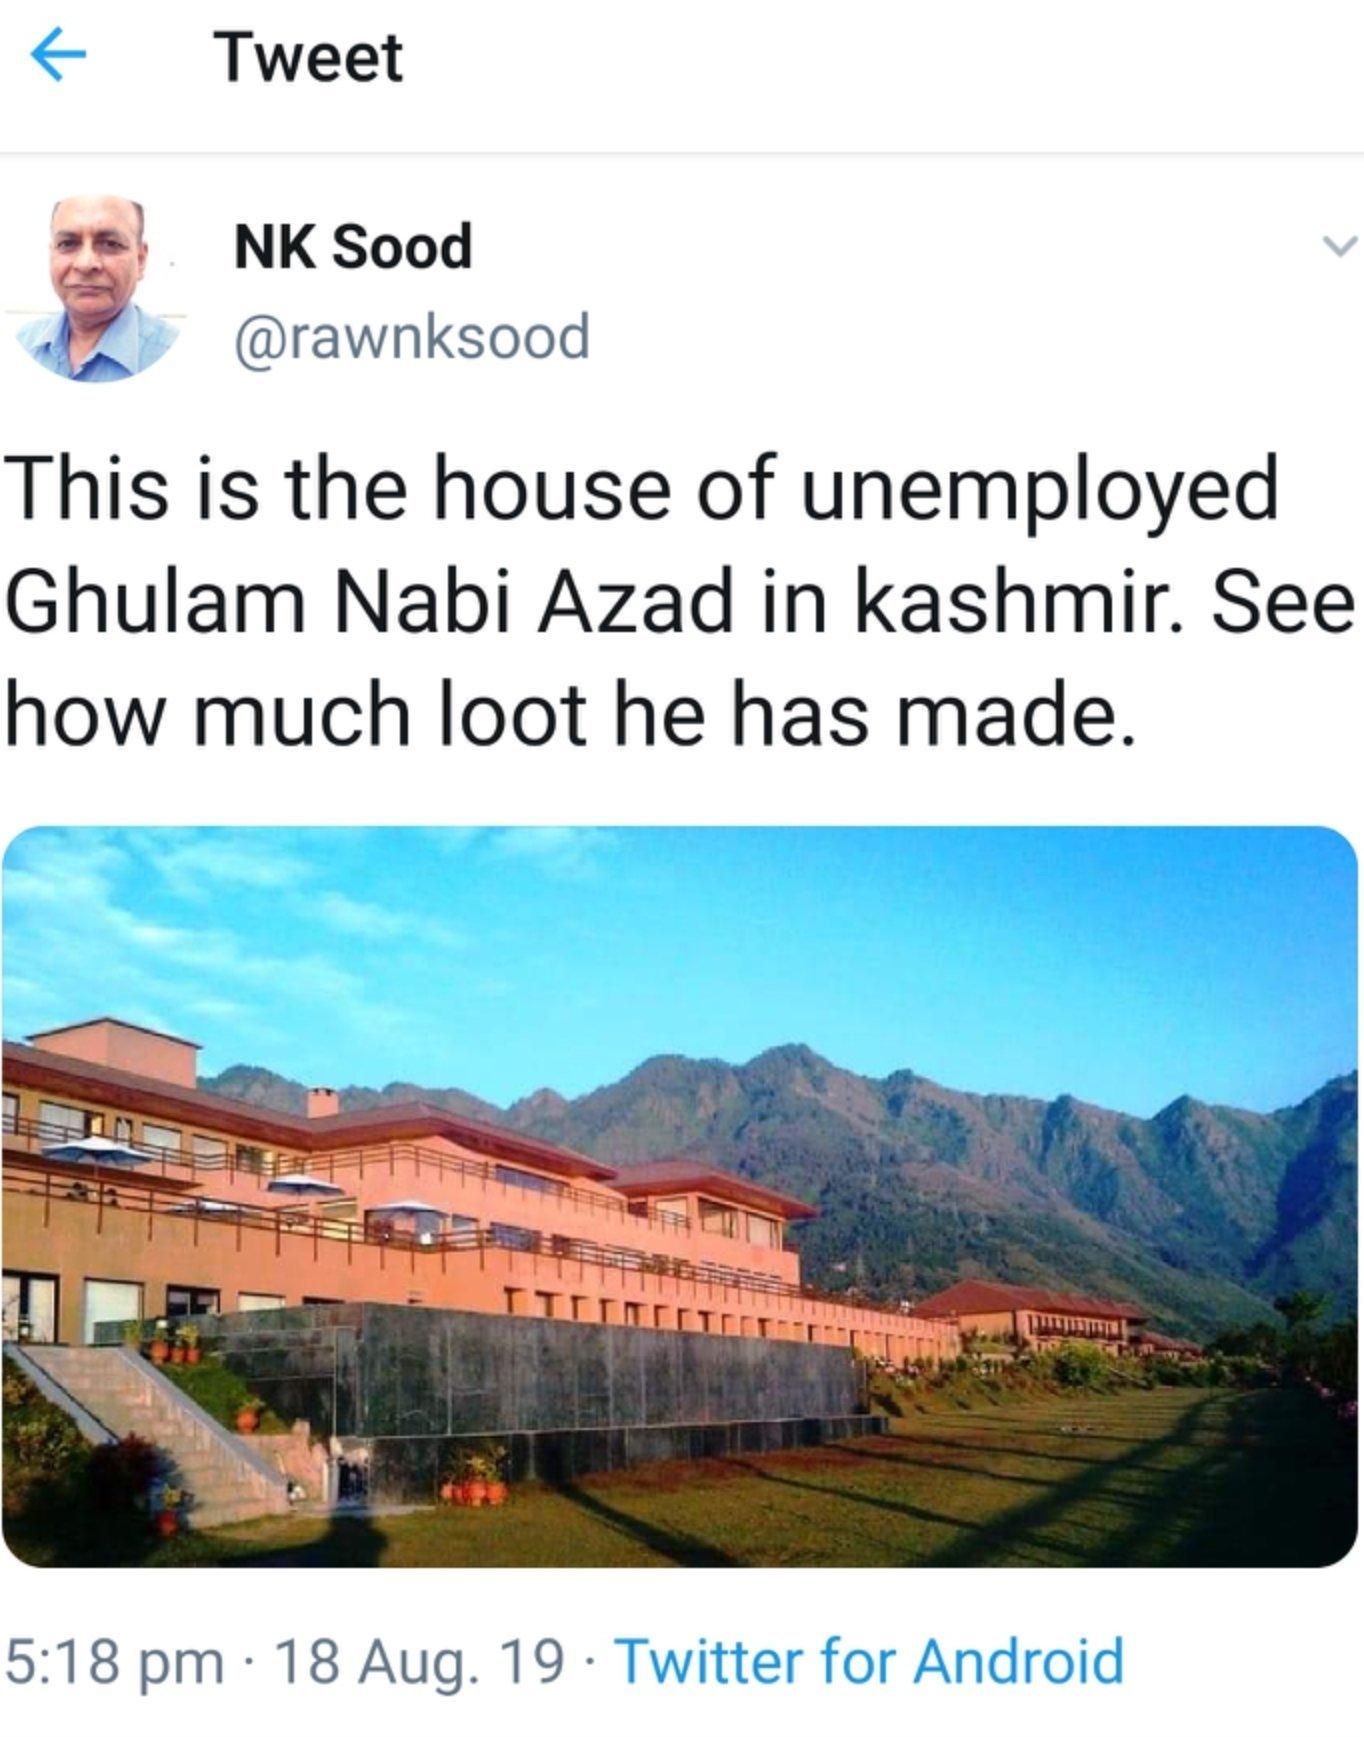 NK Sood tweet.